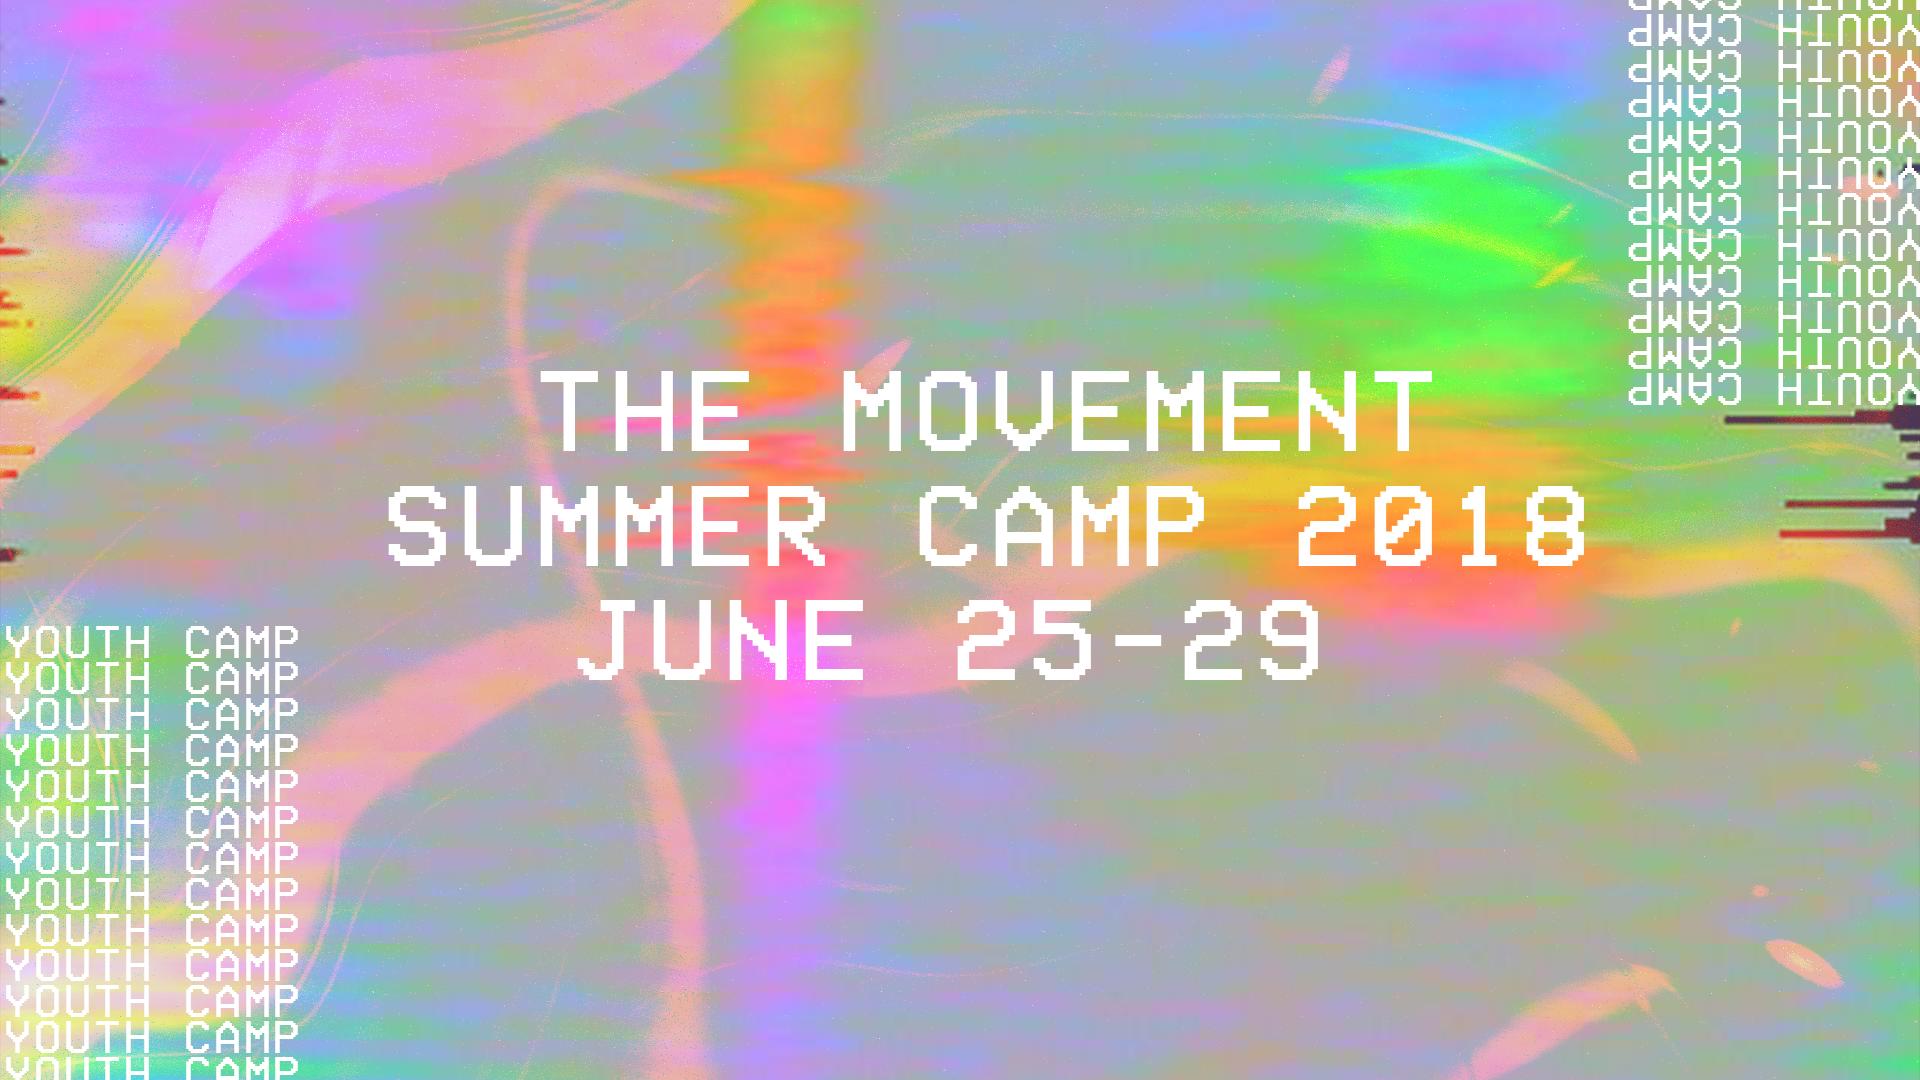 Mvmt camp 2018